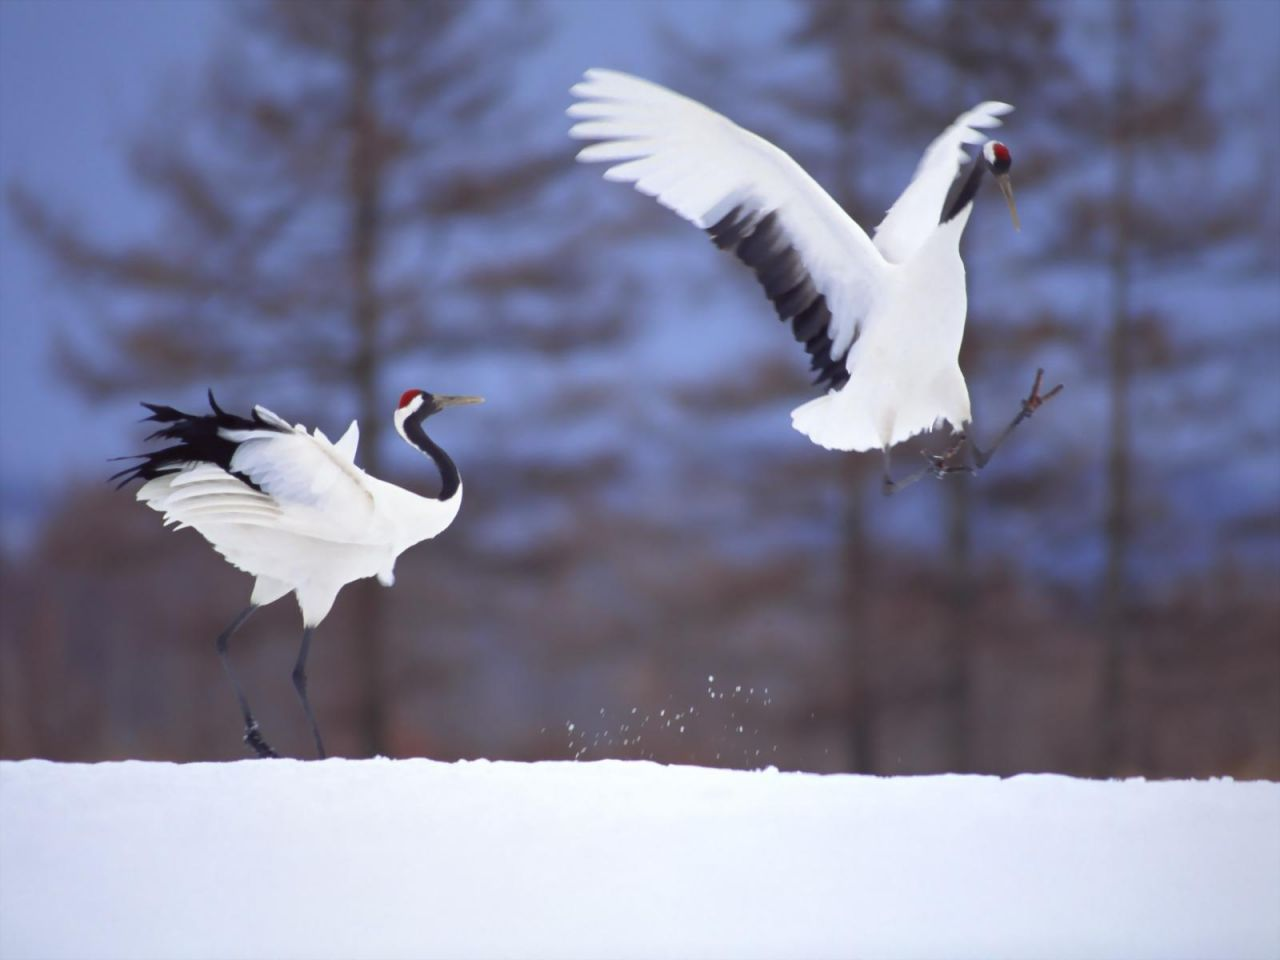 Japanese Crane On Snow Wallpaper 1280x960